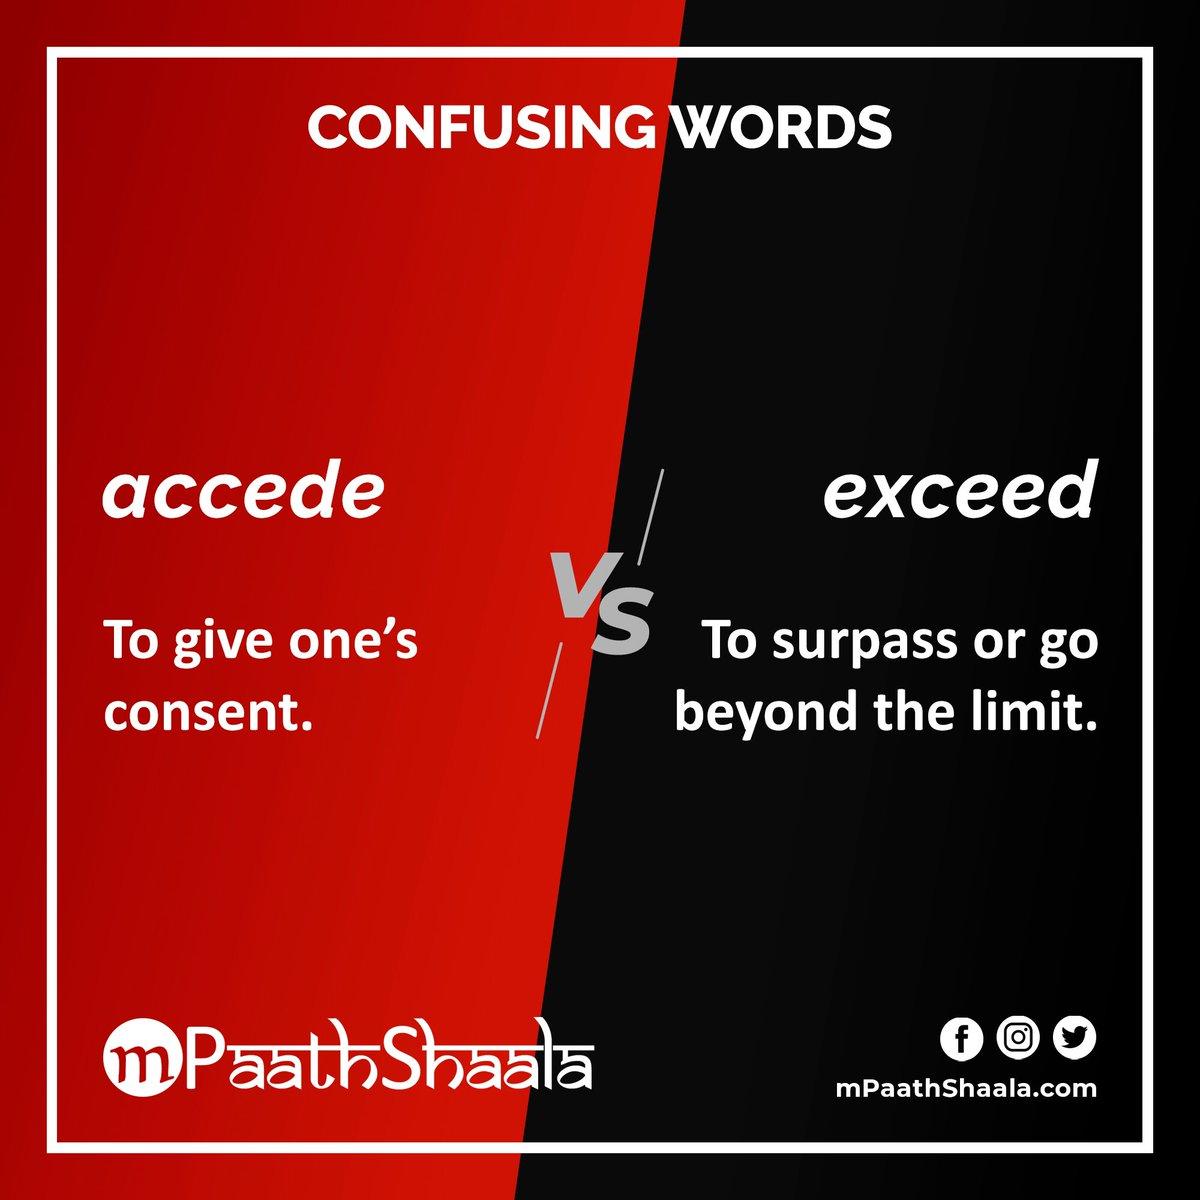 #ConfusingWords accede versus exceed  . #Vocabulary #English #EnglishVocabulary #IELTS  #TOEFL #Words #Spelling #Learning #Education #WordNerd #Homophones #Homonyms https://t.co/kfhfSDKbdo